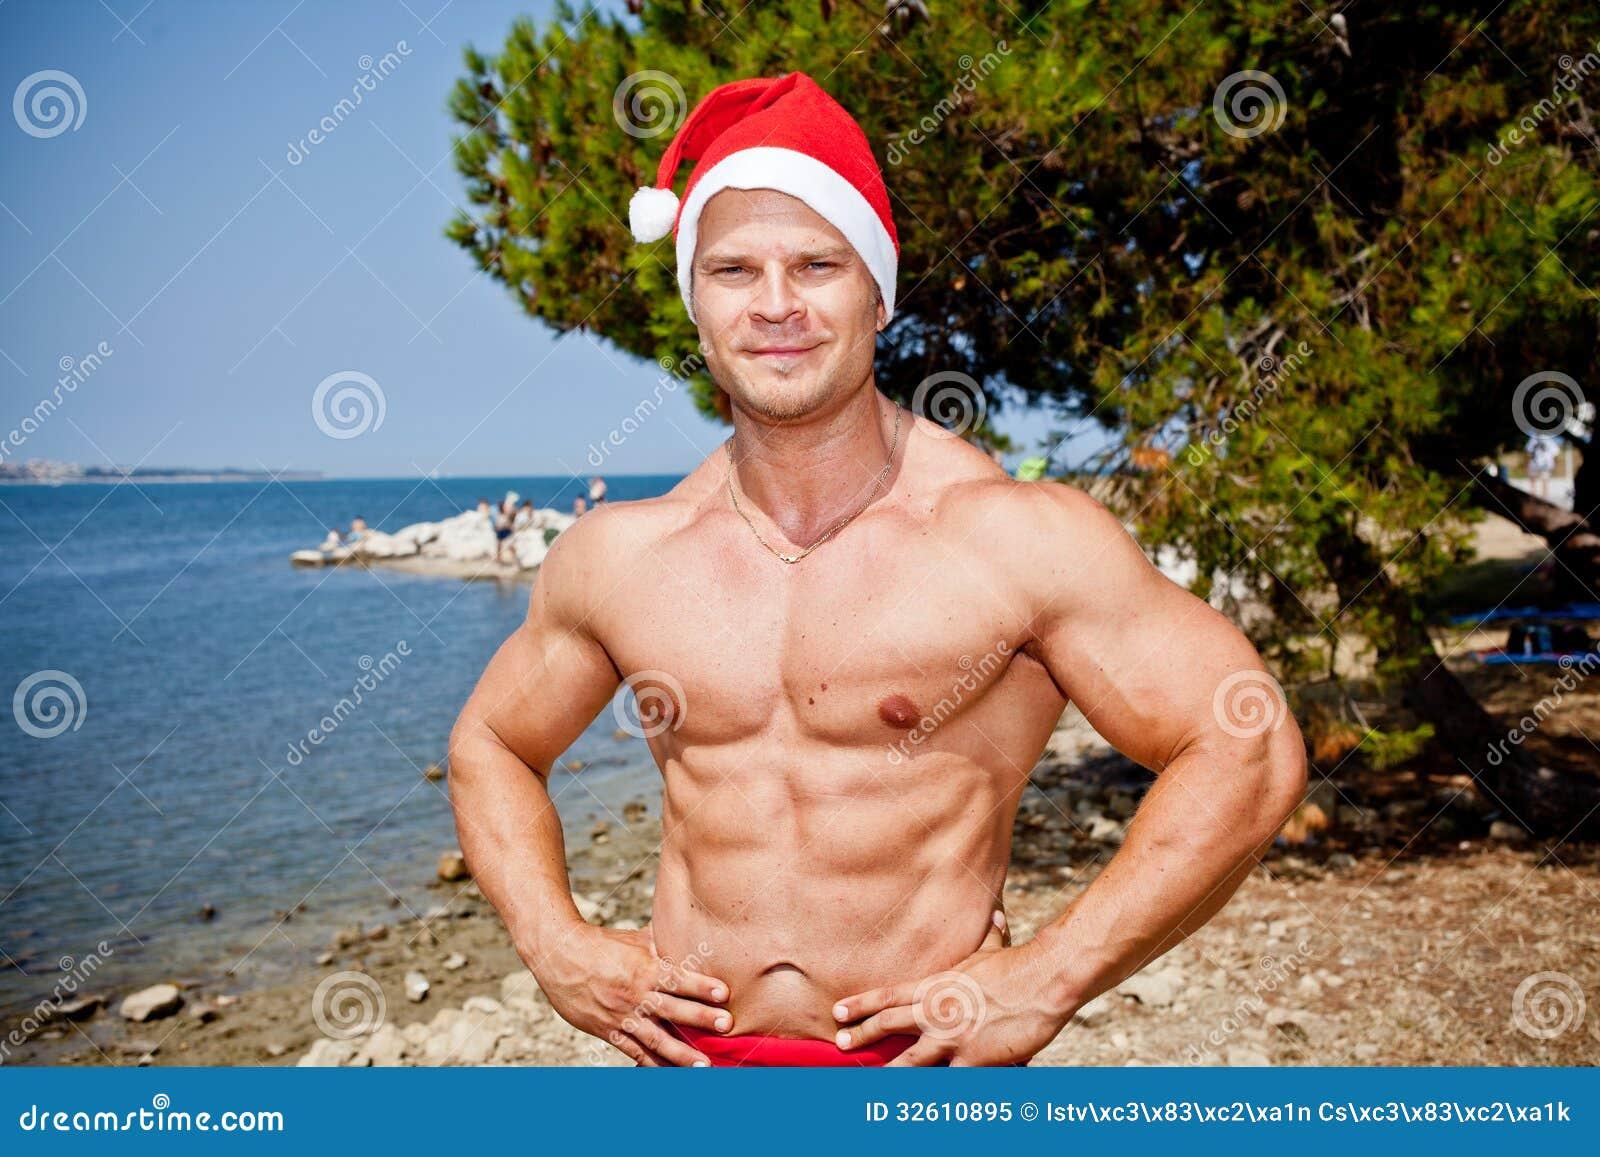 Muscular Santa Claus Show Royalty Free Stock Photo Image 32610895